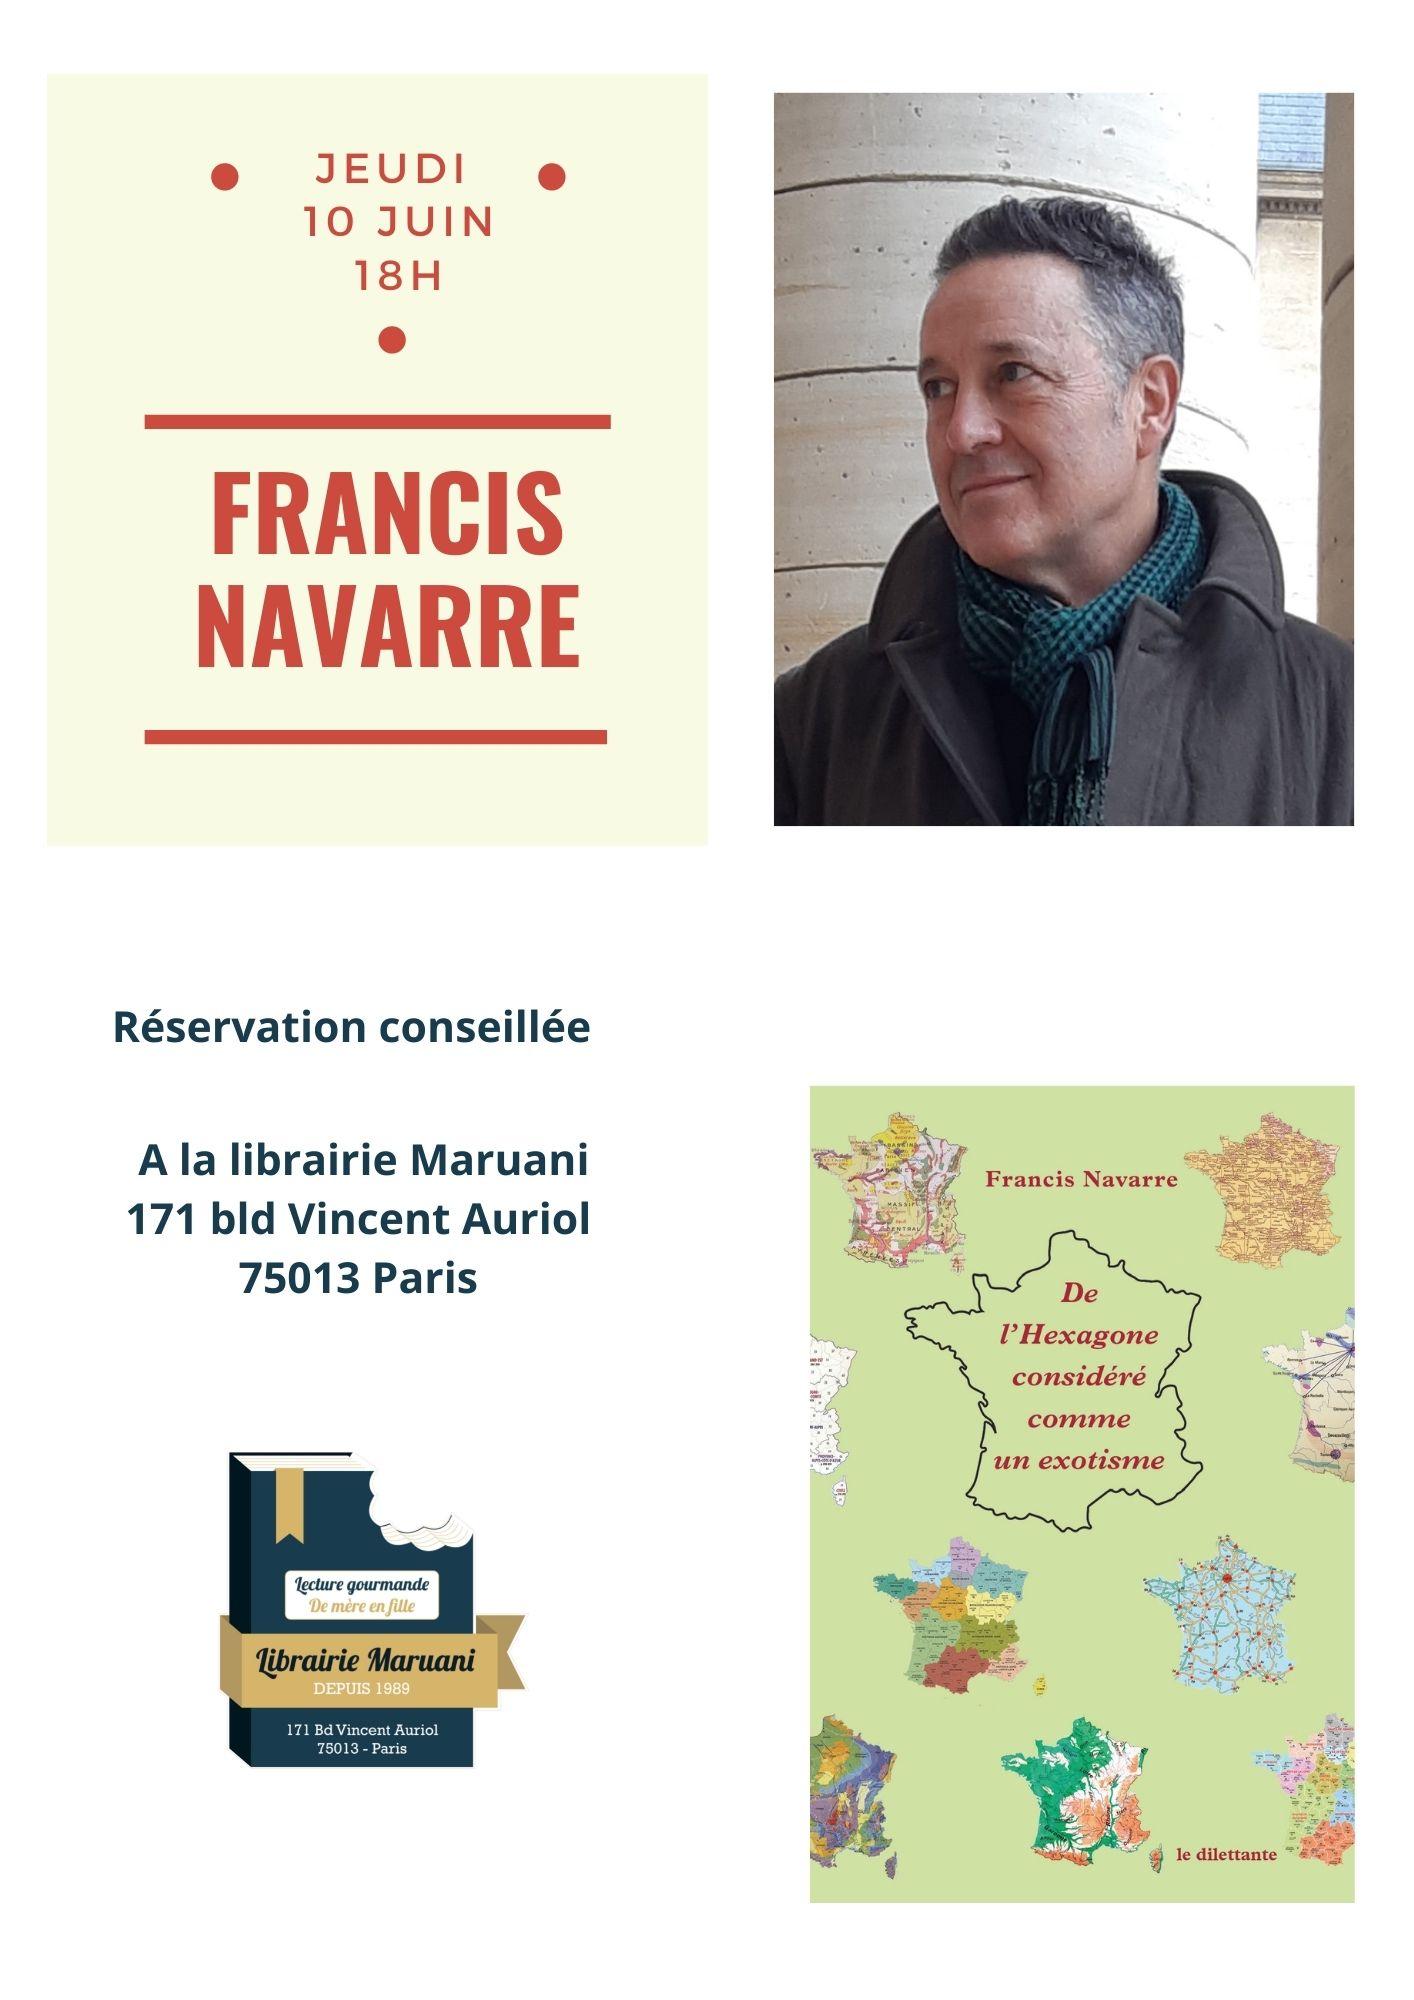 Rencontre Francis Navarre